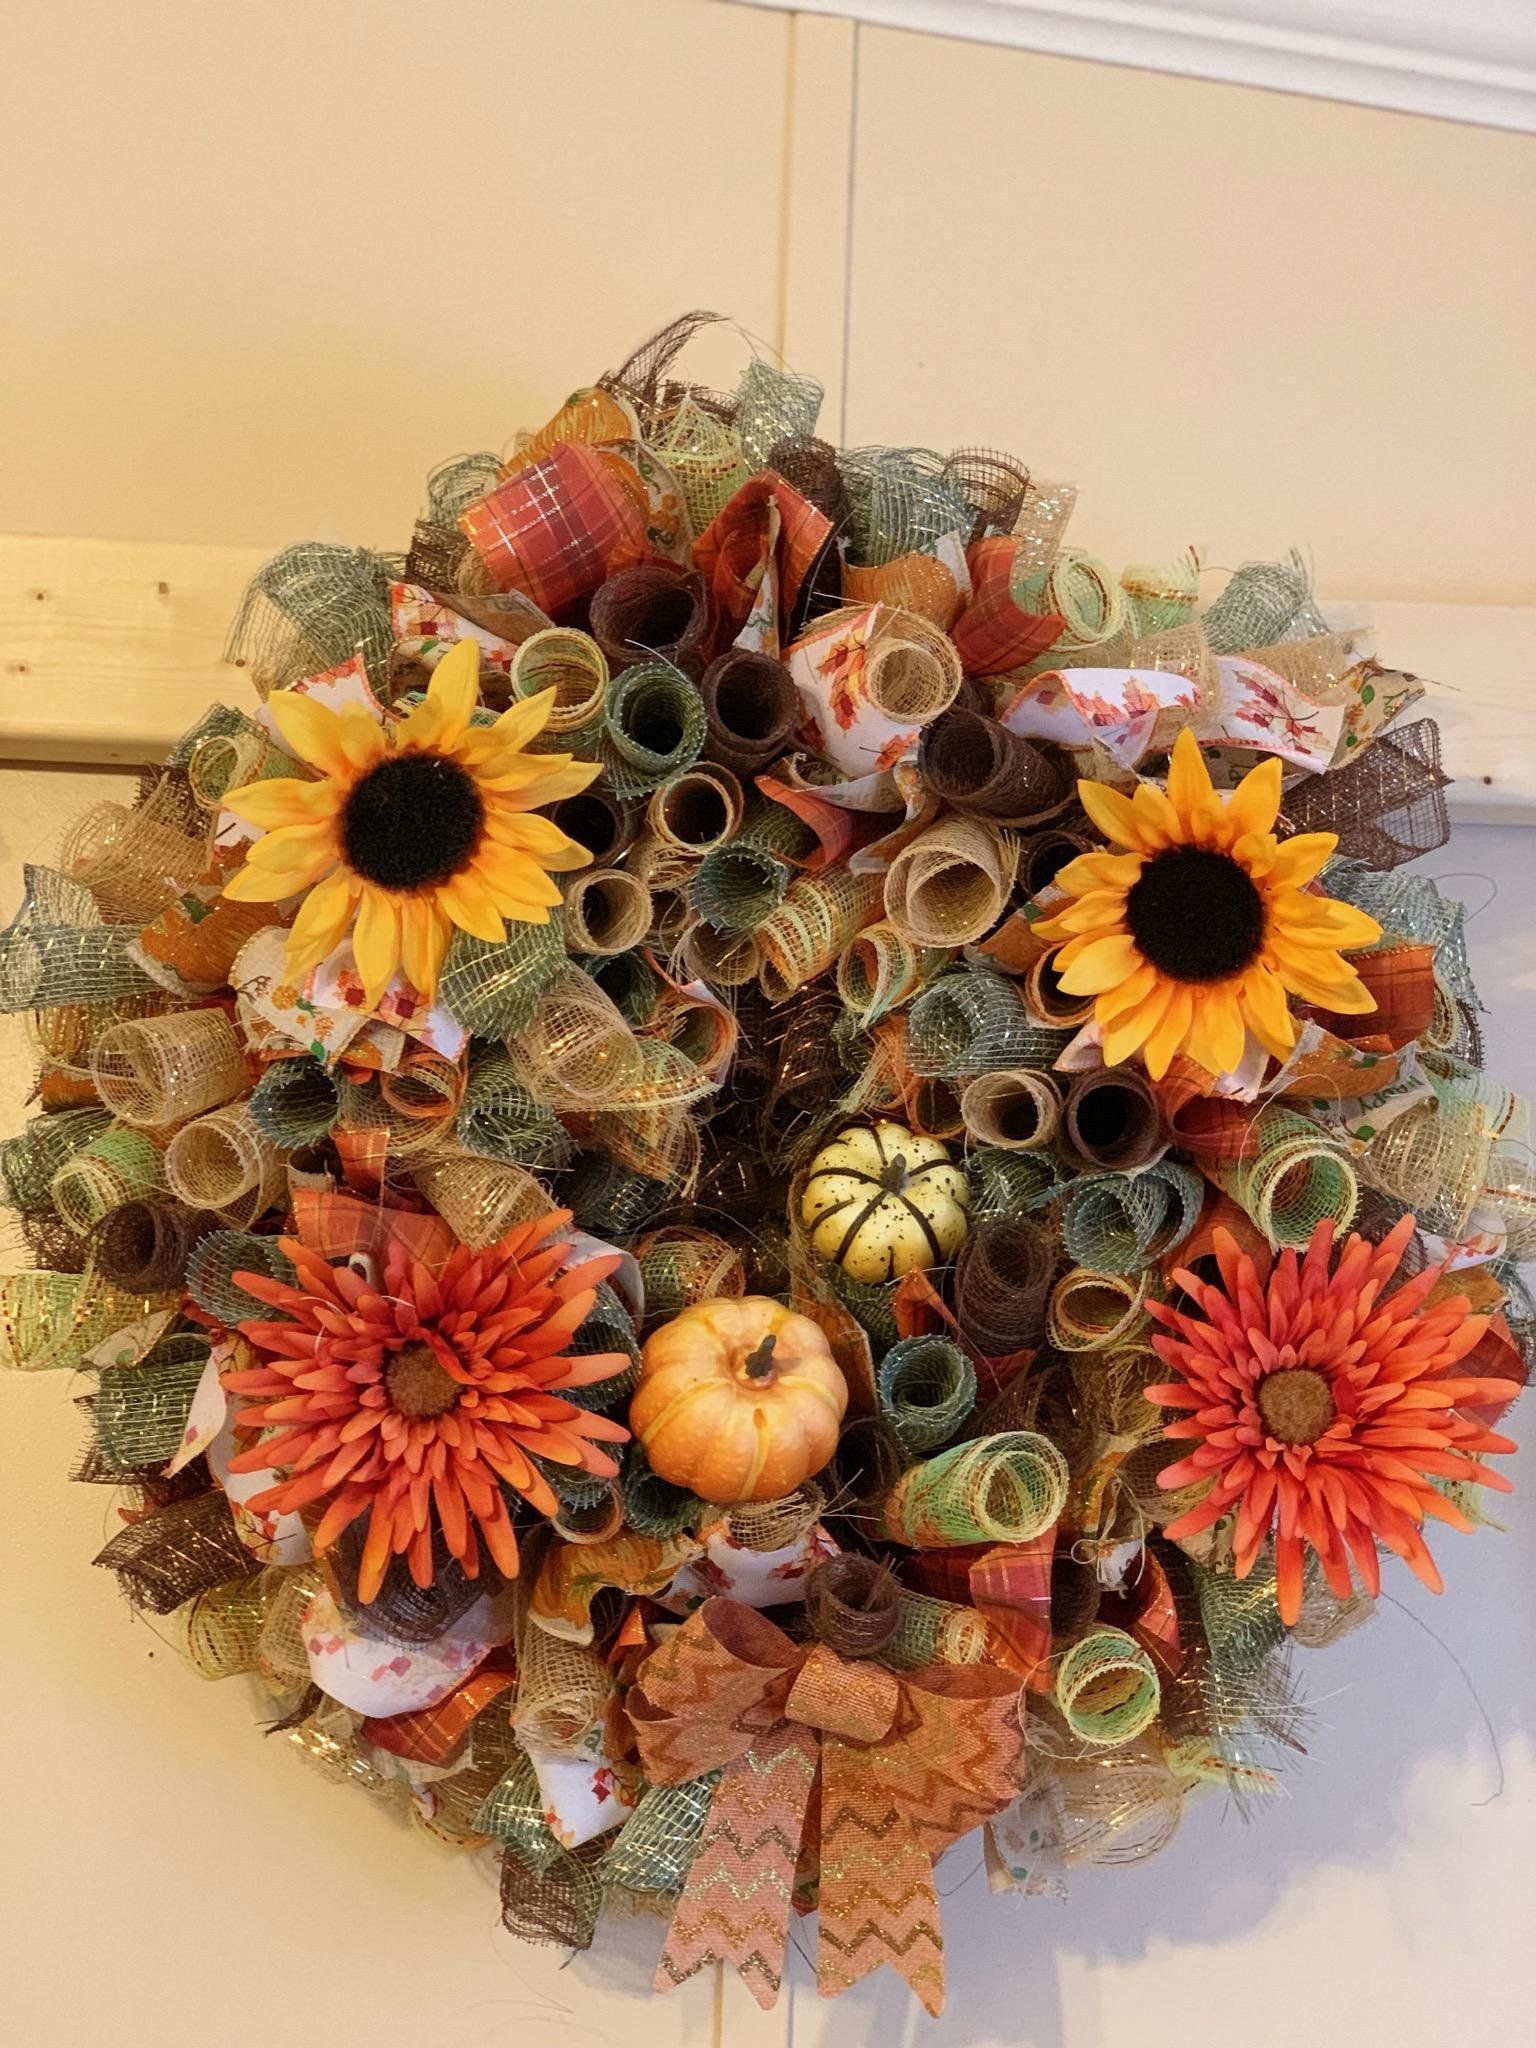 Photo of Fall Sunflower Wreath, Fall Wreath, Sunflower Wreath, Harvest Wreath, Thankful Wreath, Pumpkin Wreath, Front Door Wreath, Door Decor